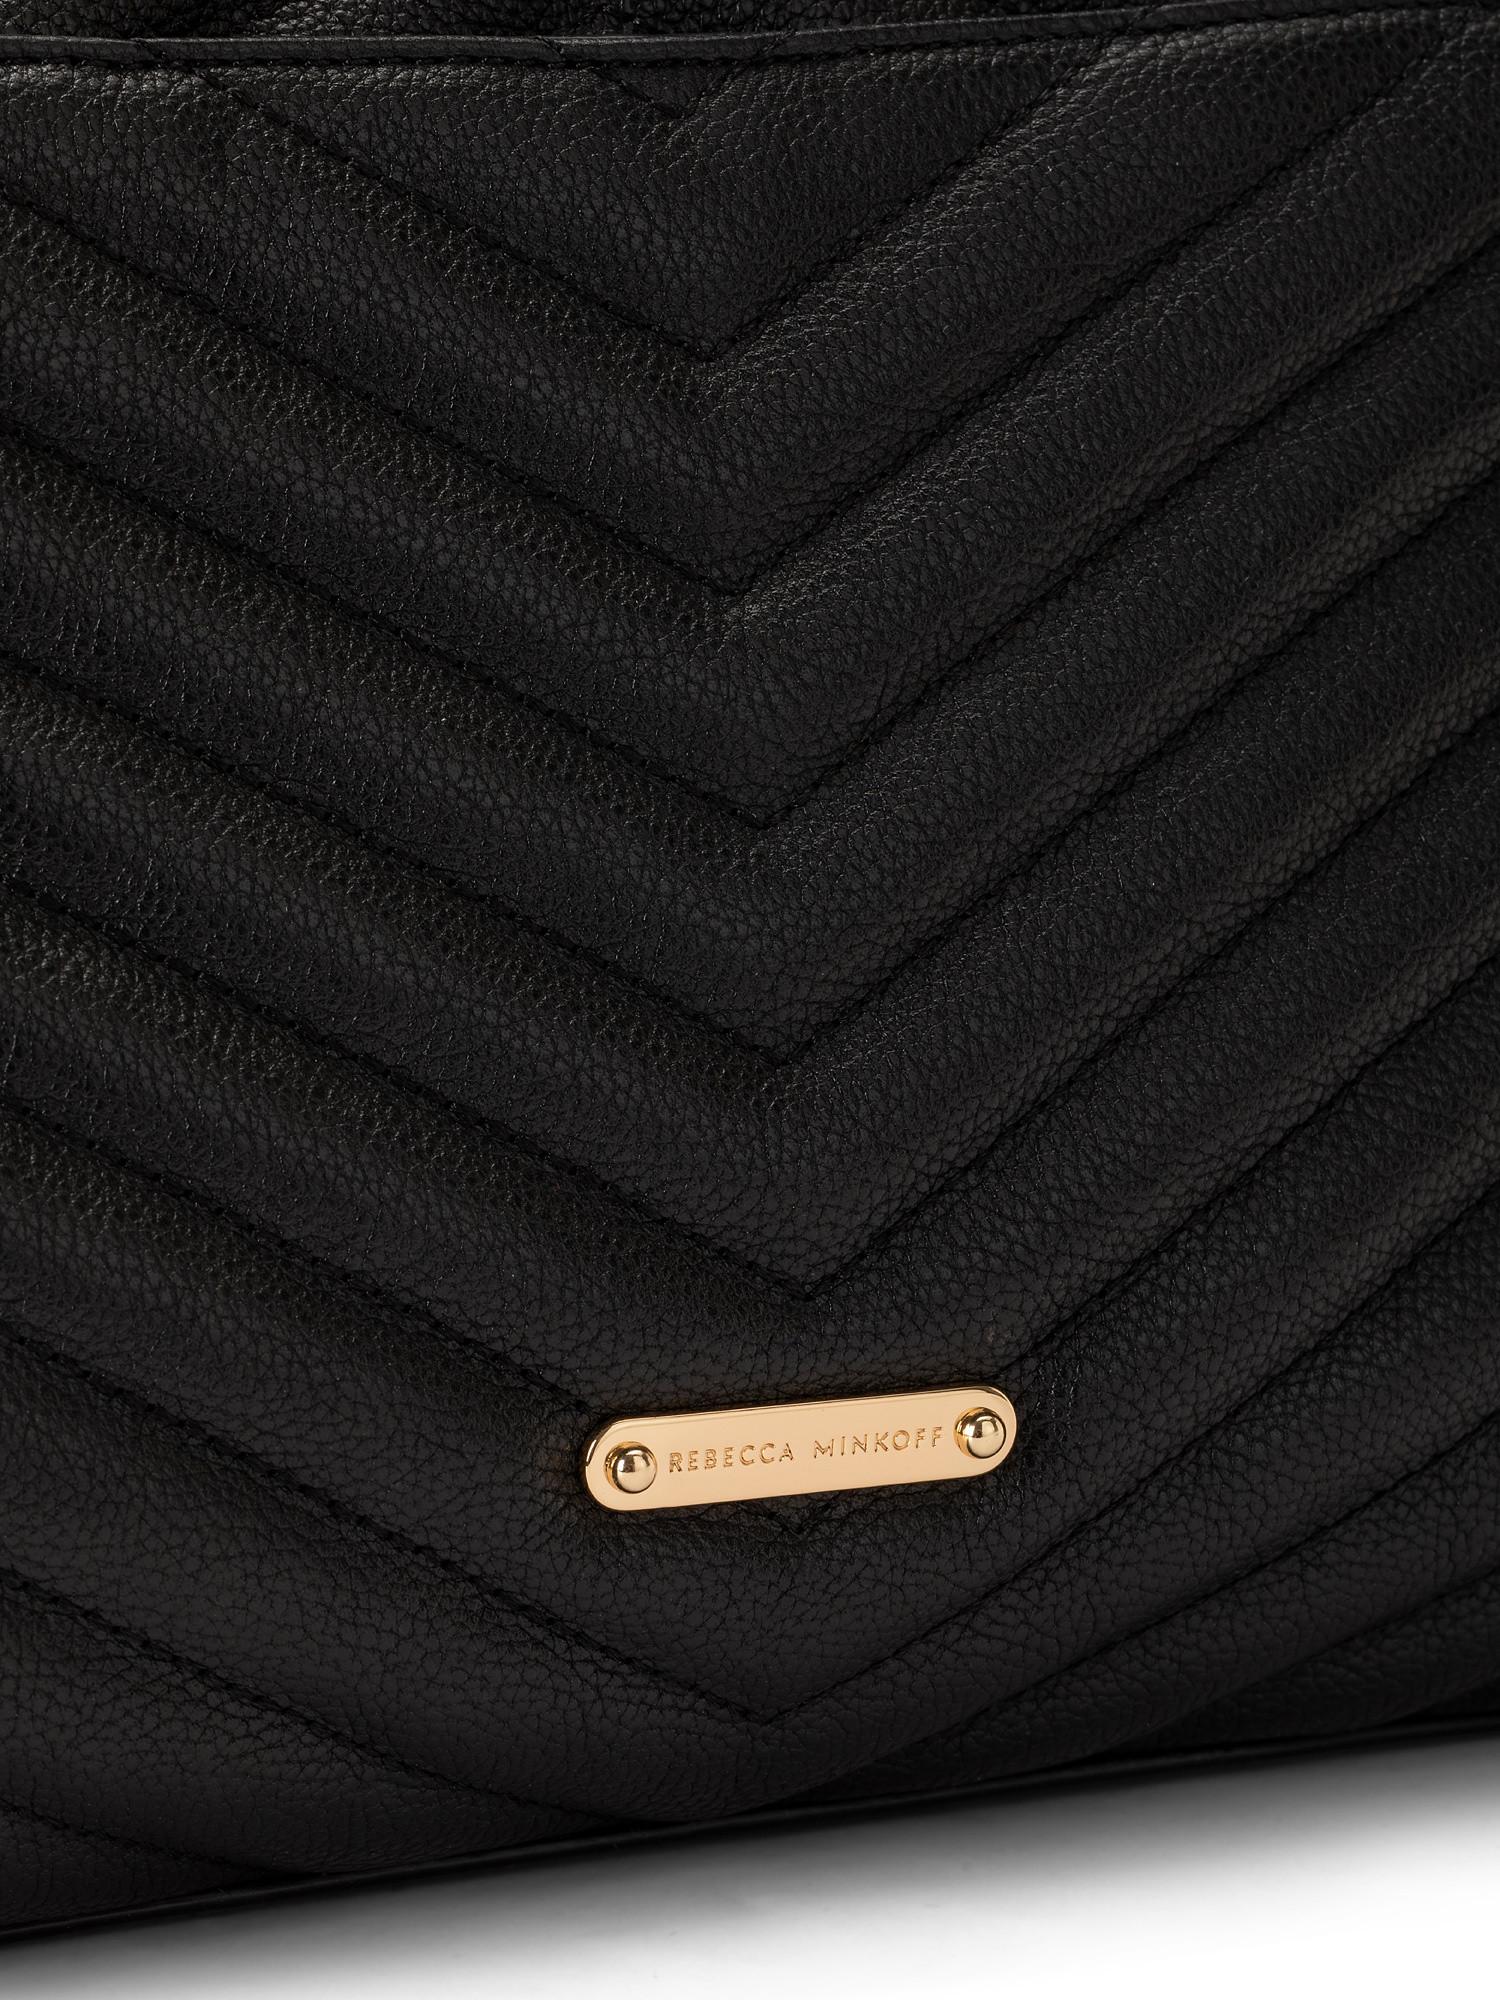 Edie Flap Shoulder Bag, Nero, large image number 2